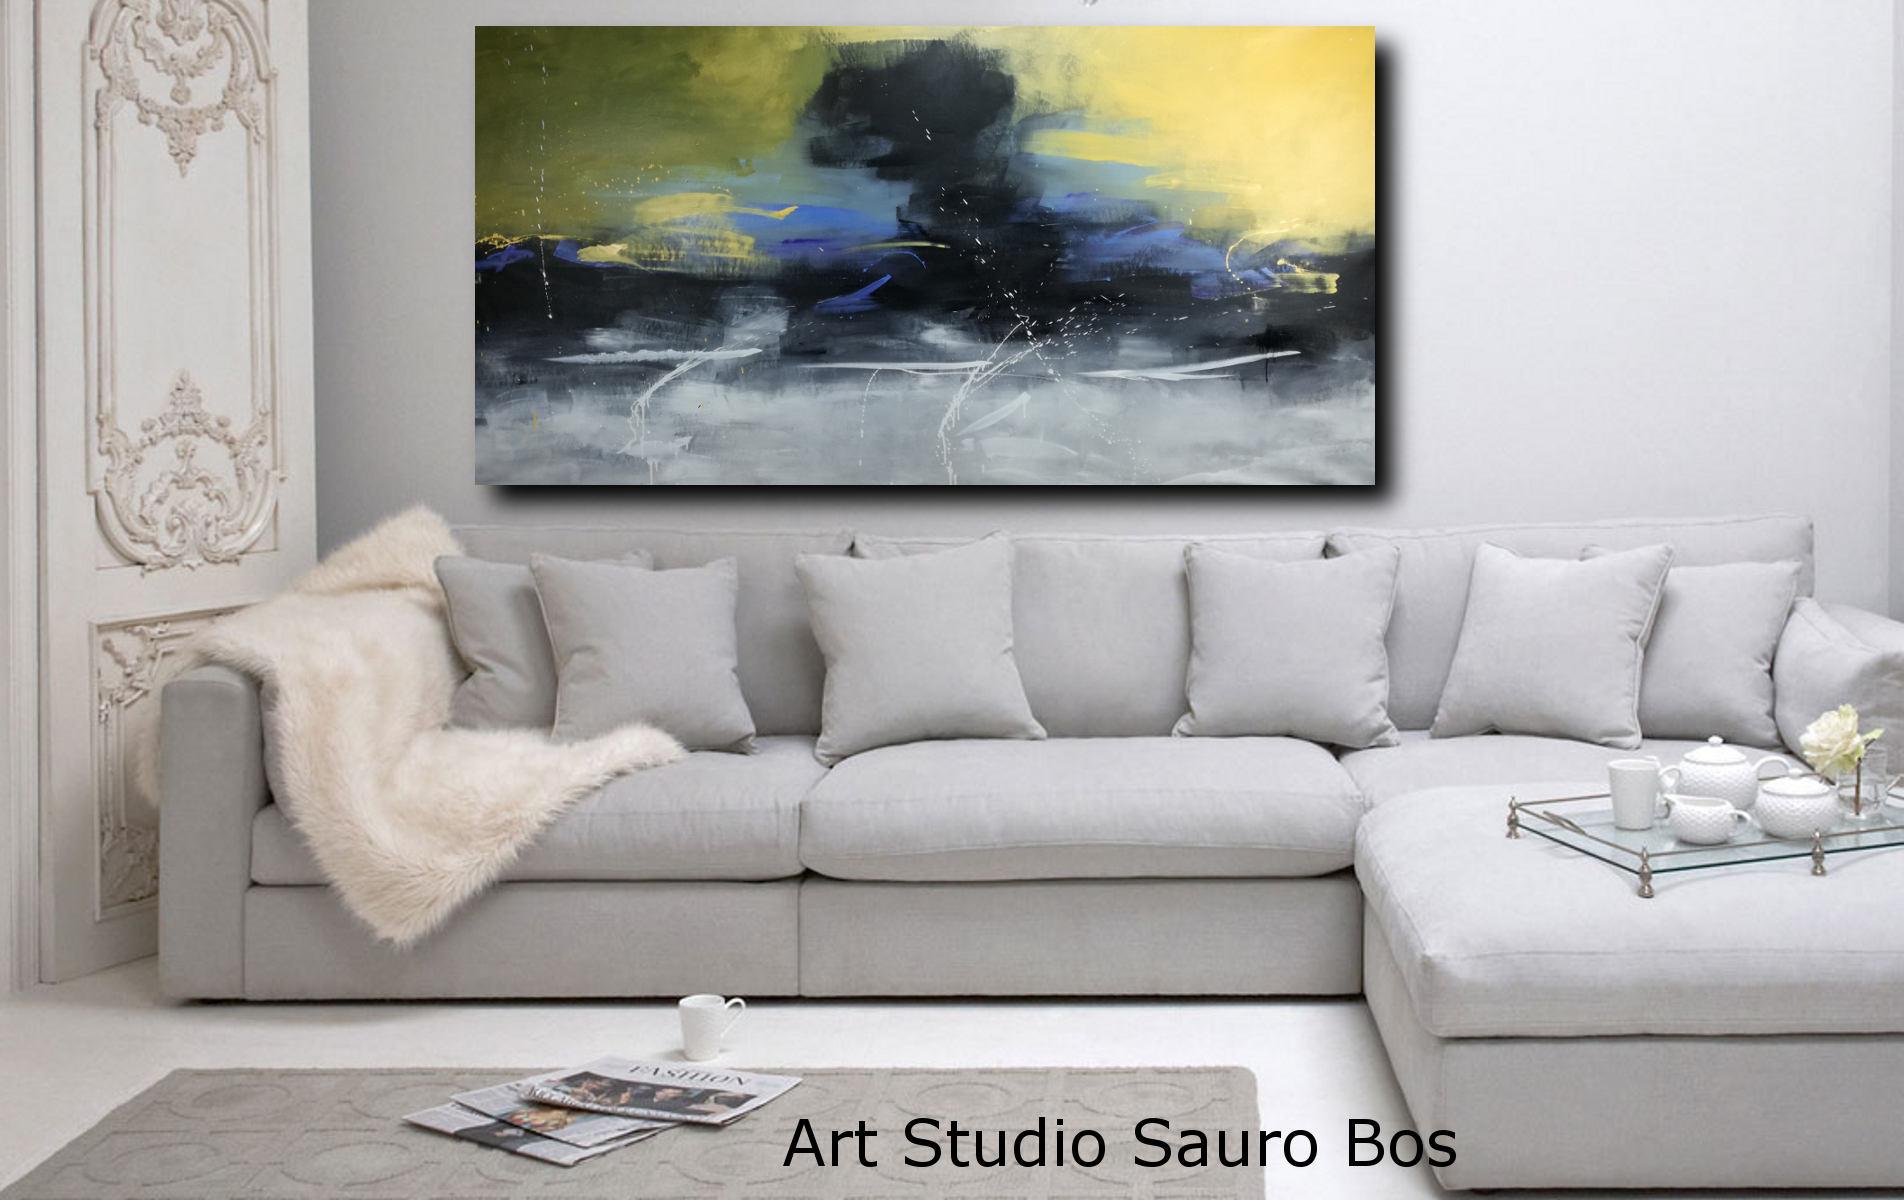 Quadri moderni paesaggi 200x100 sauro bos for Quadri moderni su tela